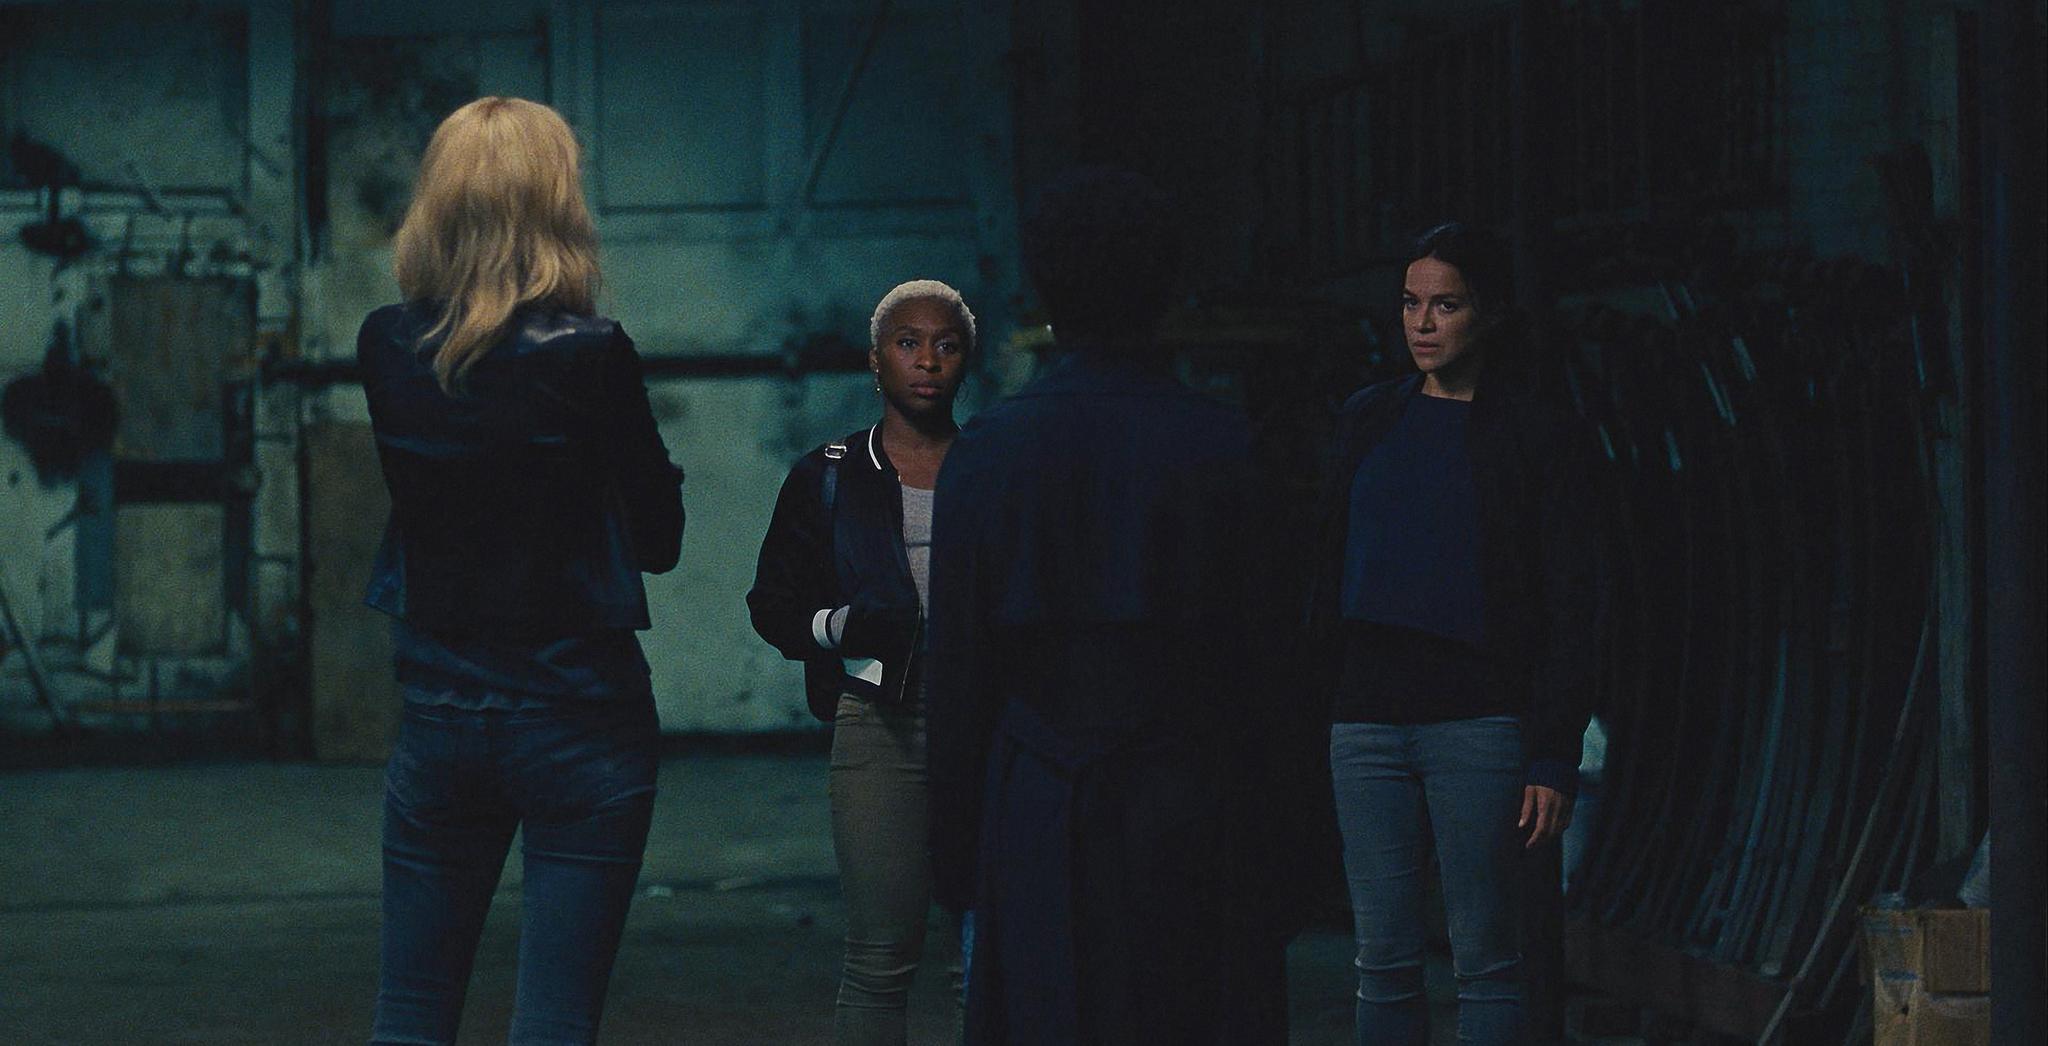 Viola Davis, Michelle Rodriguez, Elizabeth Debicki, and Cynthia Erivo in Widows (2018)